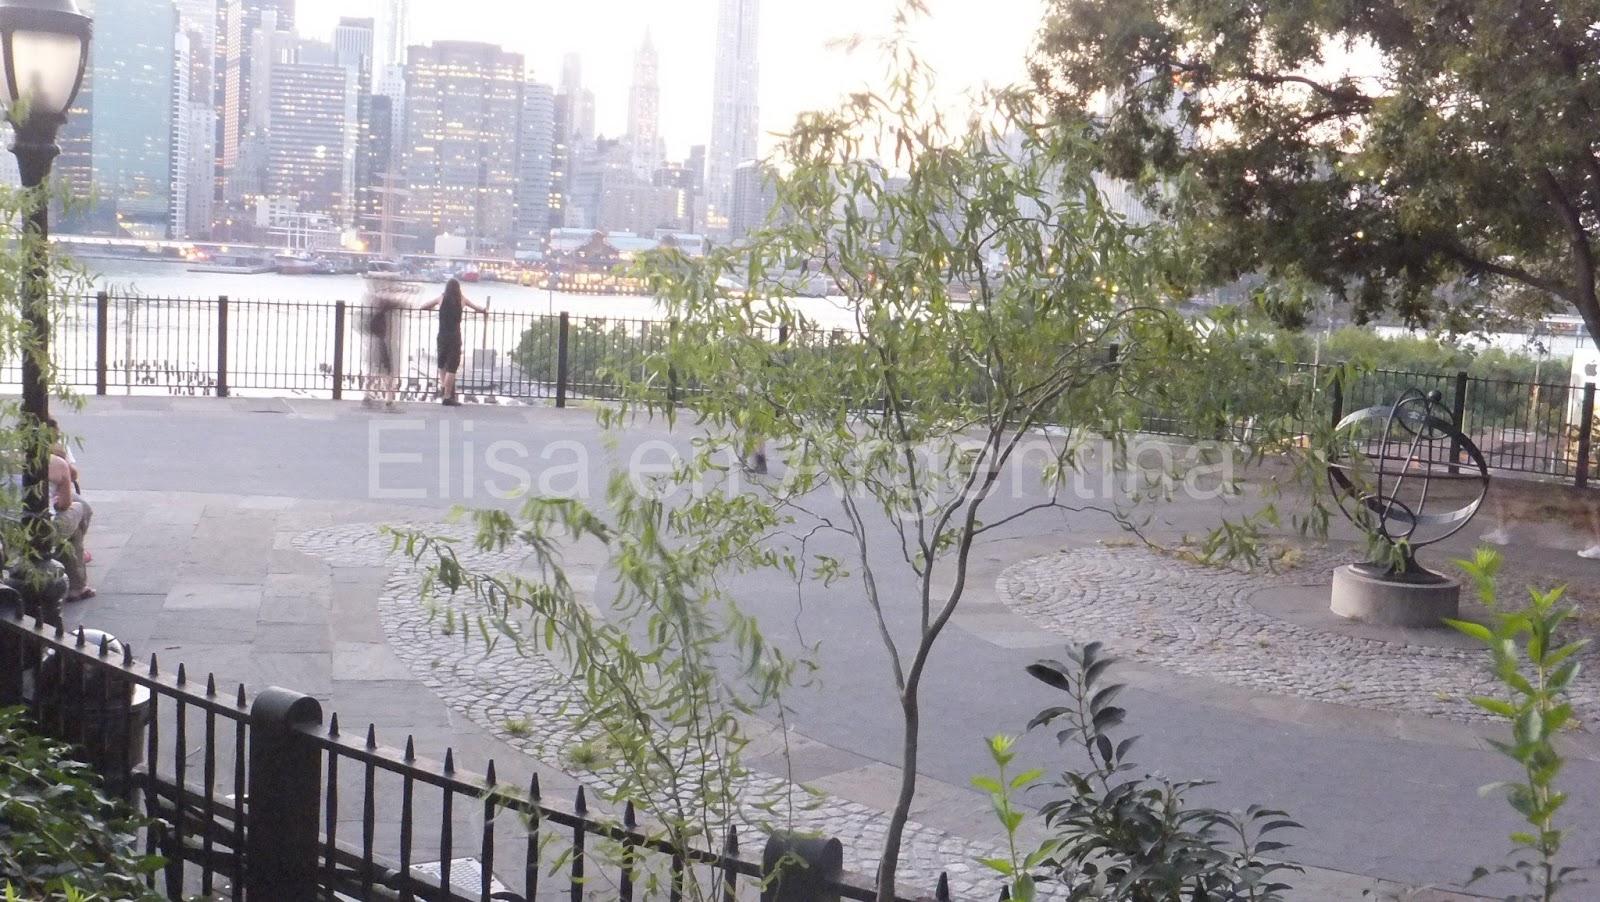 Manhattan al atardecer, Brooklyn Heights, New York, Elisa N, Blog de Viajes, Lifestyle, Travel